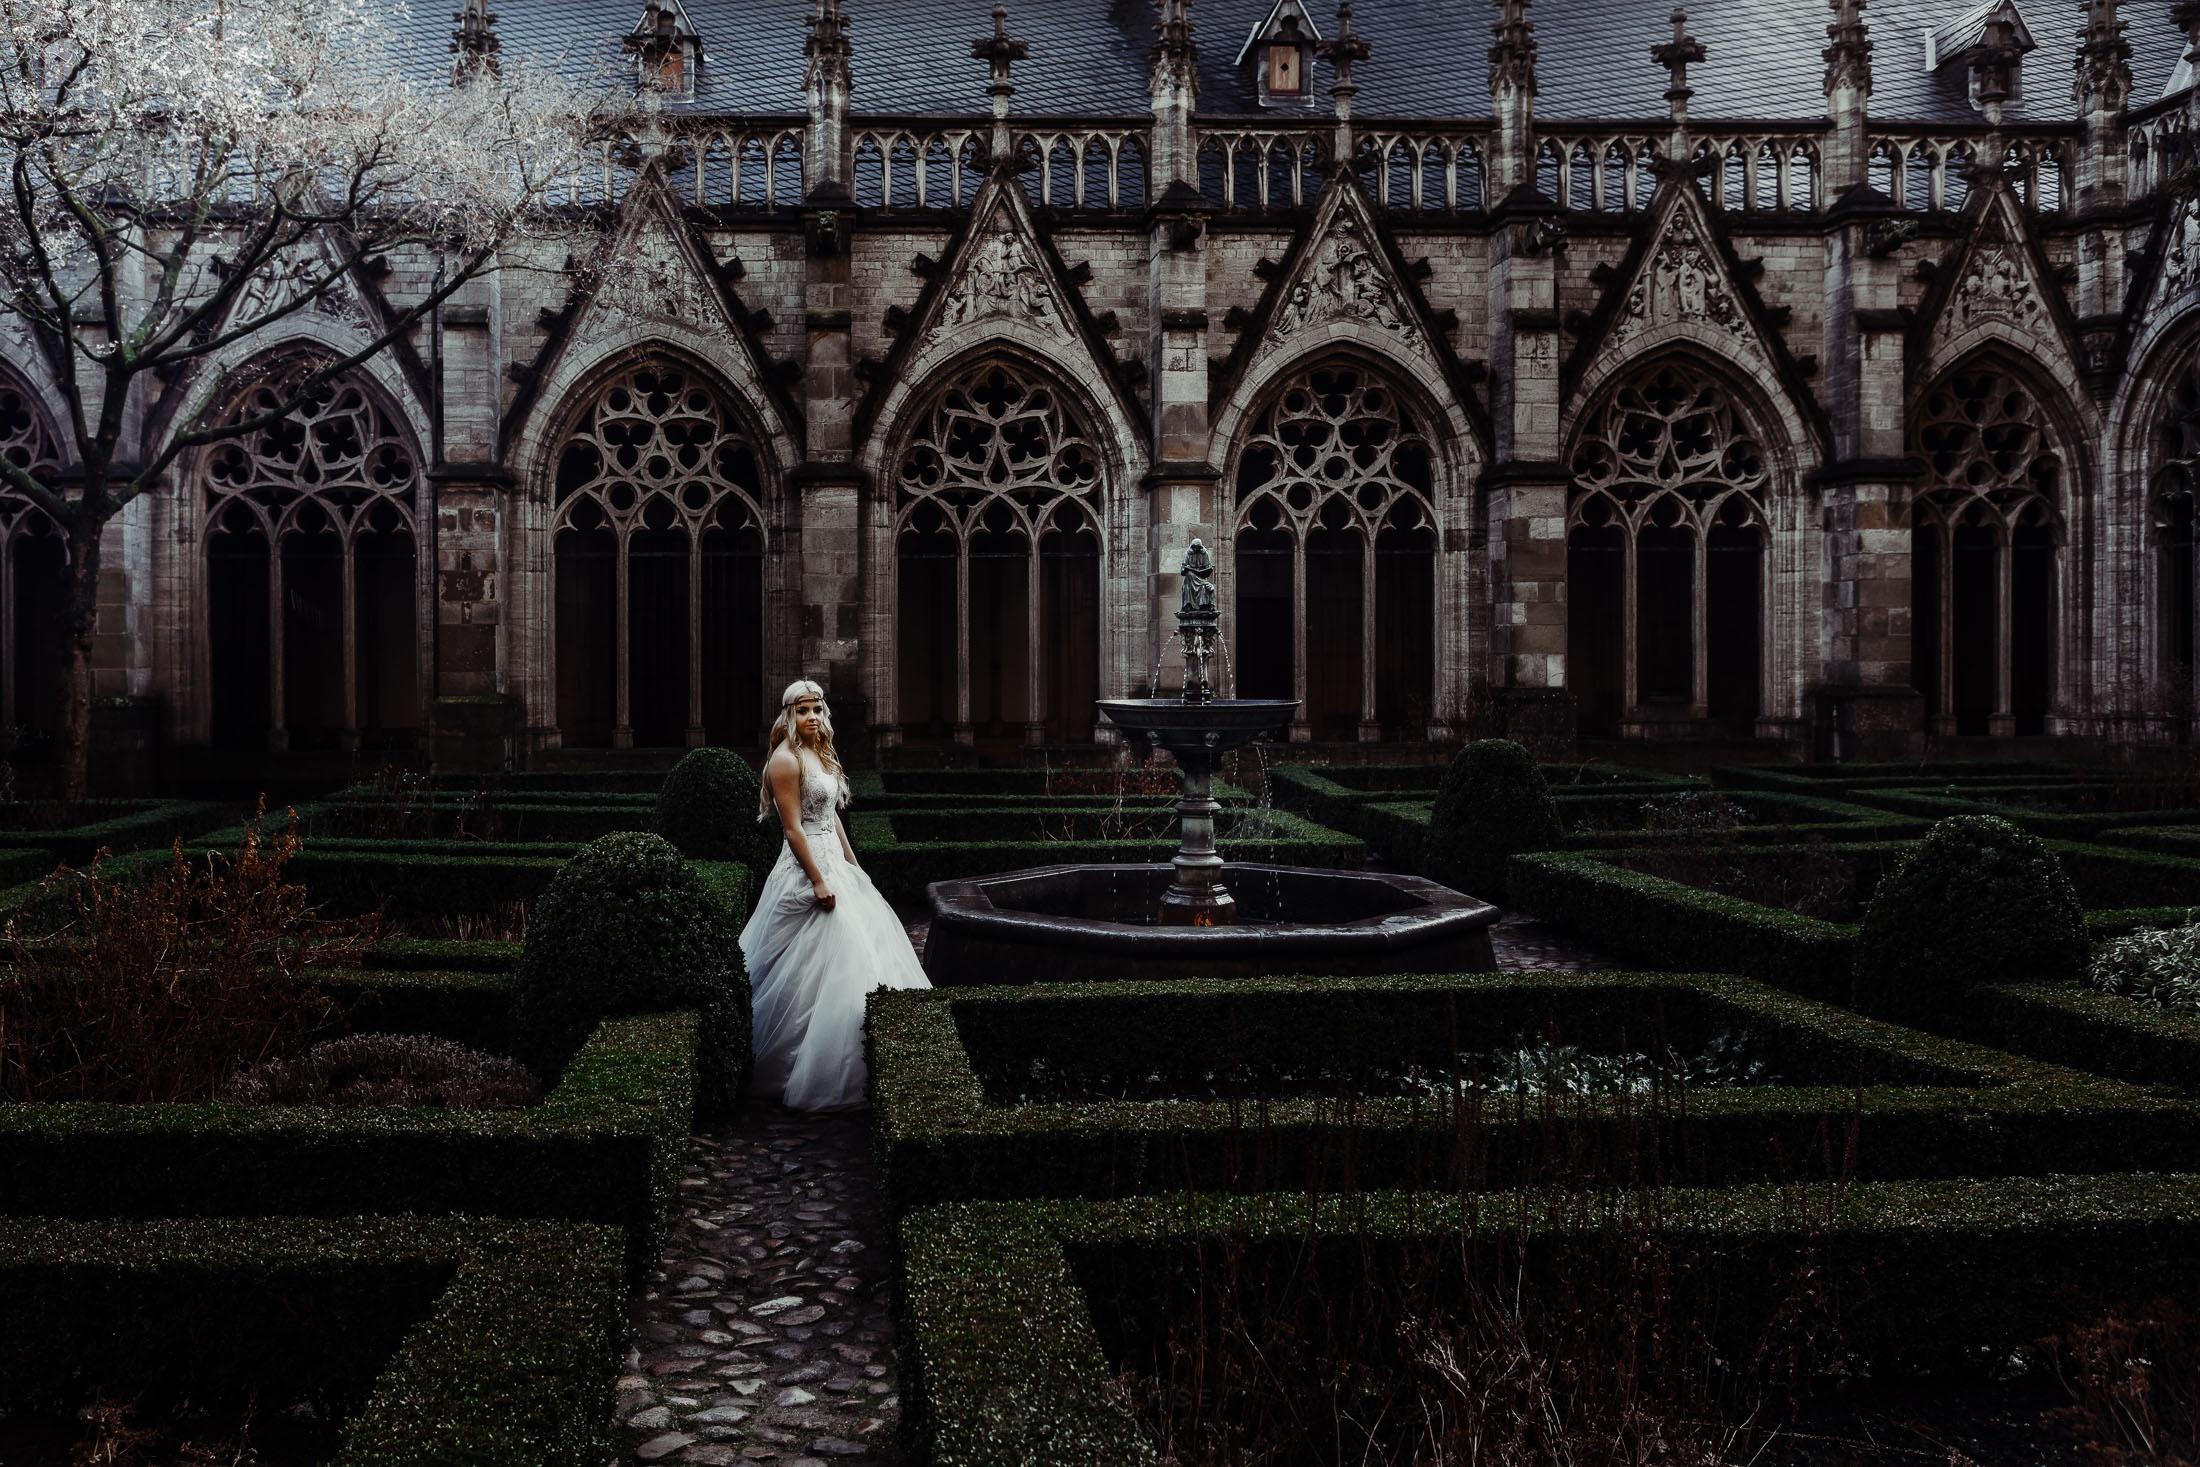 Portretfotografie The Sleeping Beauty fotosessie by Birense Fotografie -1-11.jpg